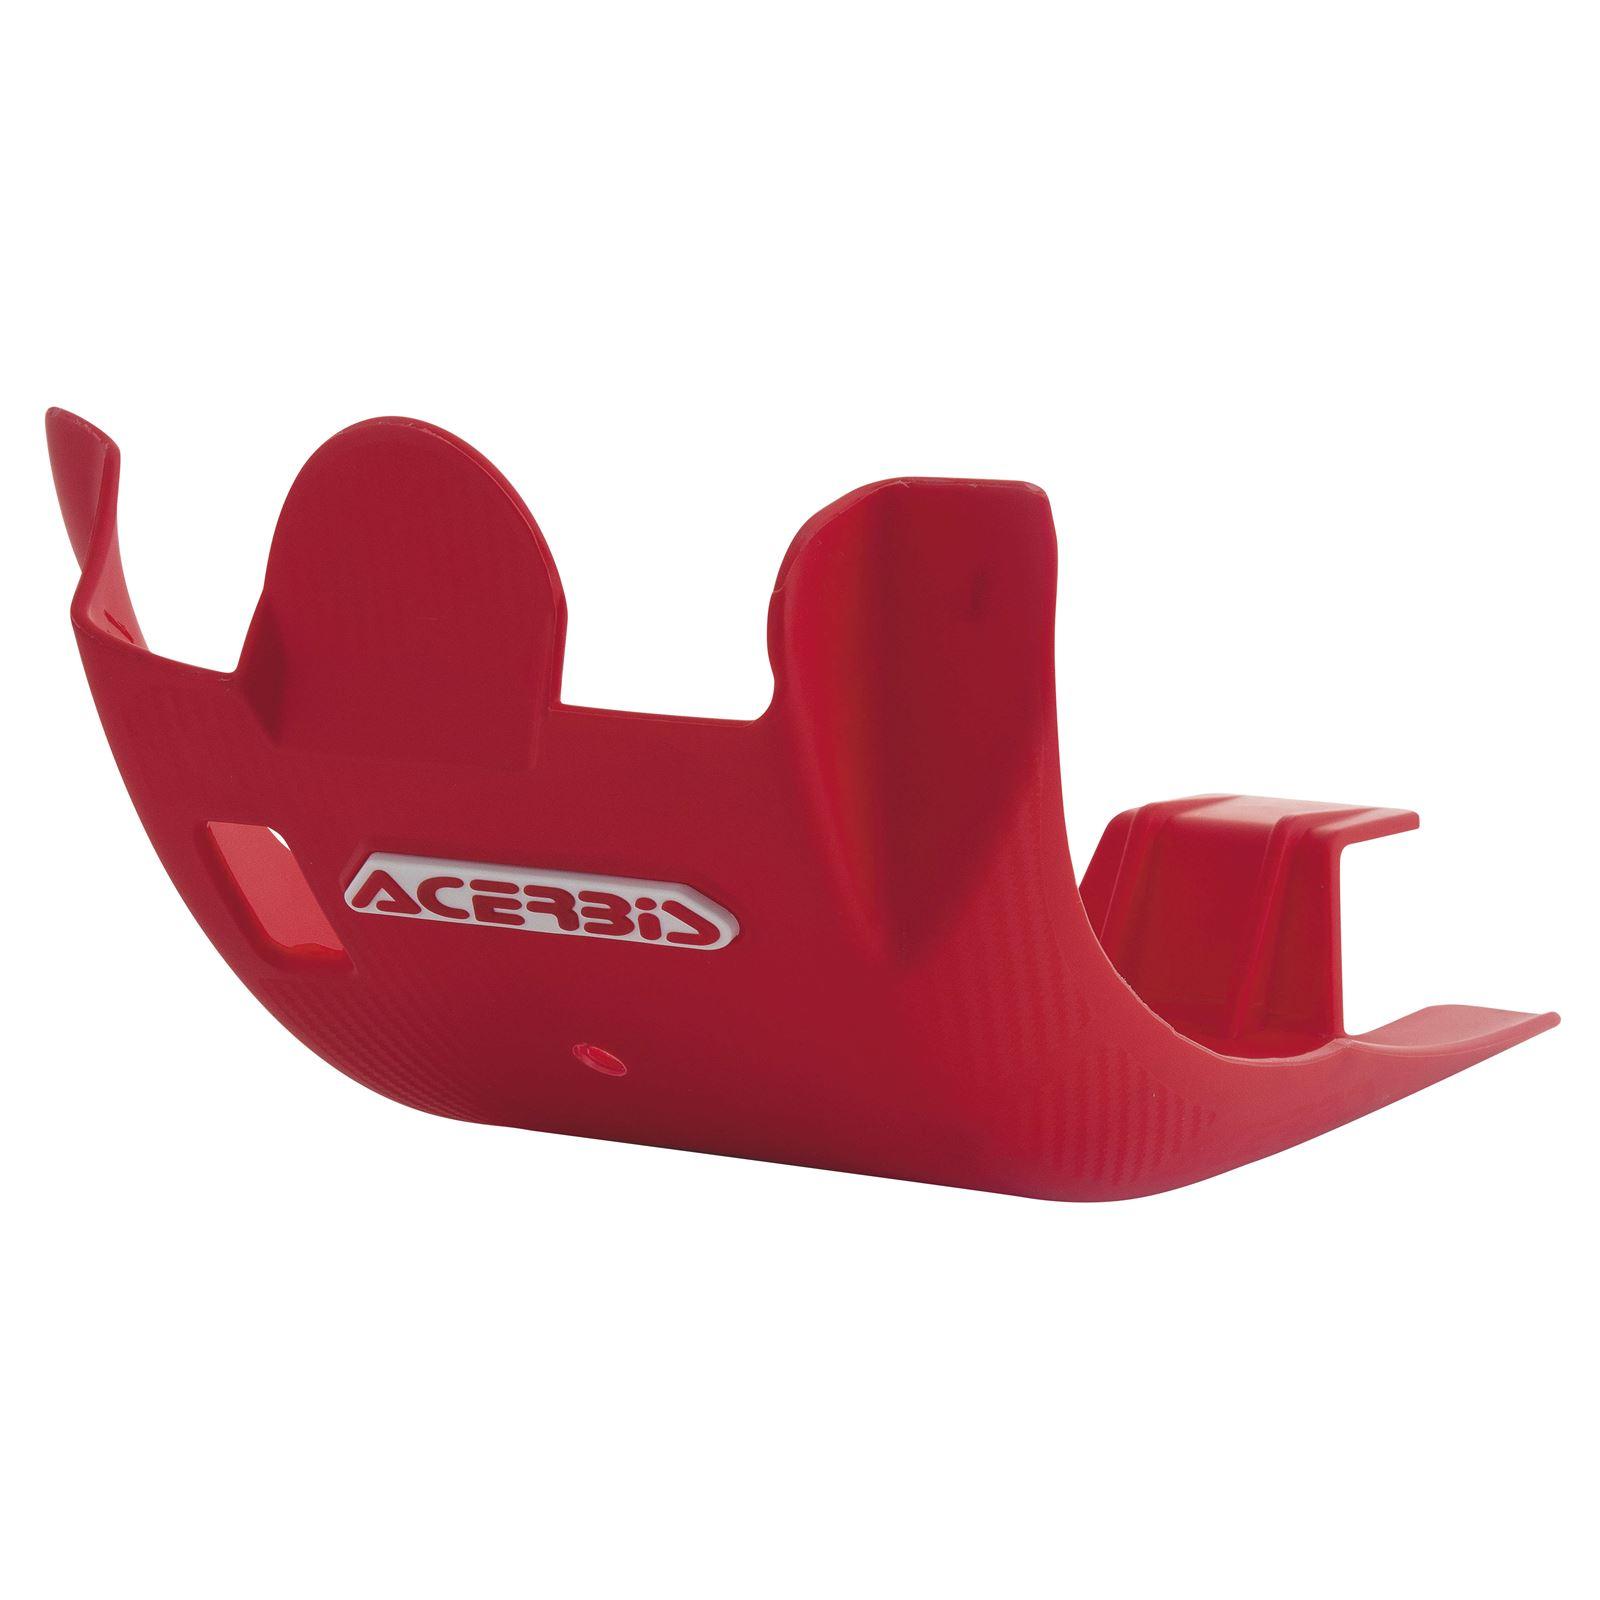 Acerbis Skid Plate